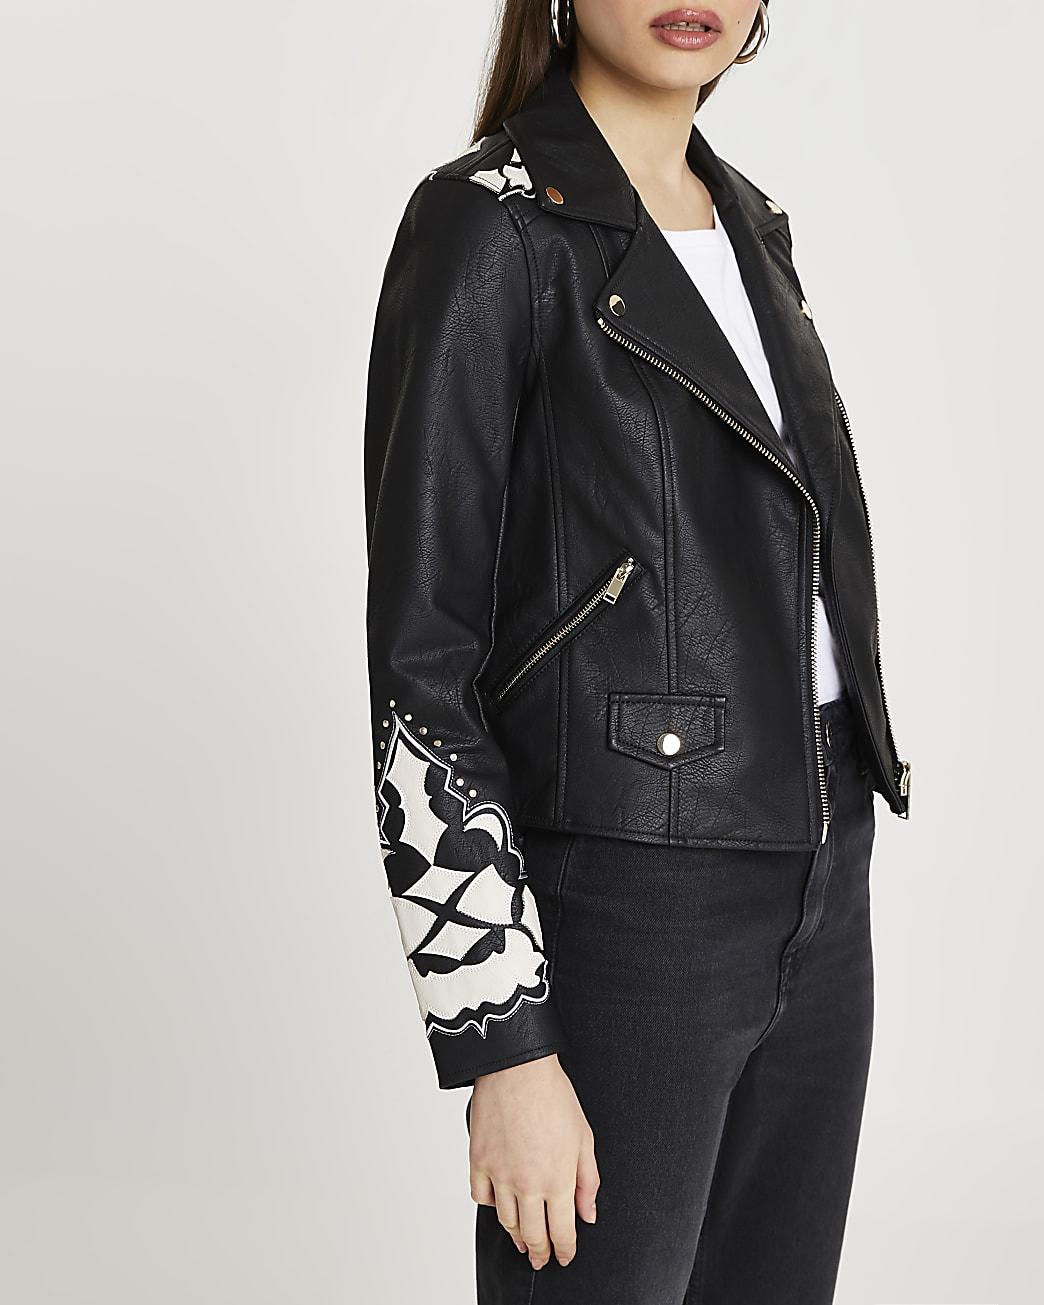 Black western cutwork studded biker jacket